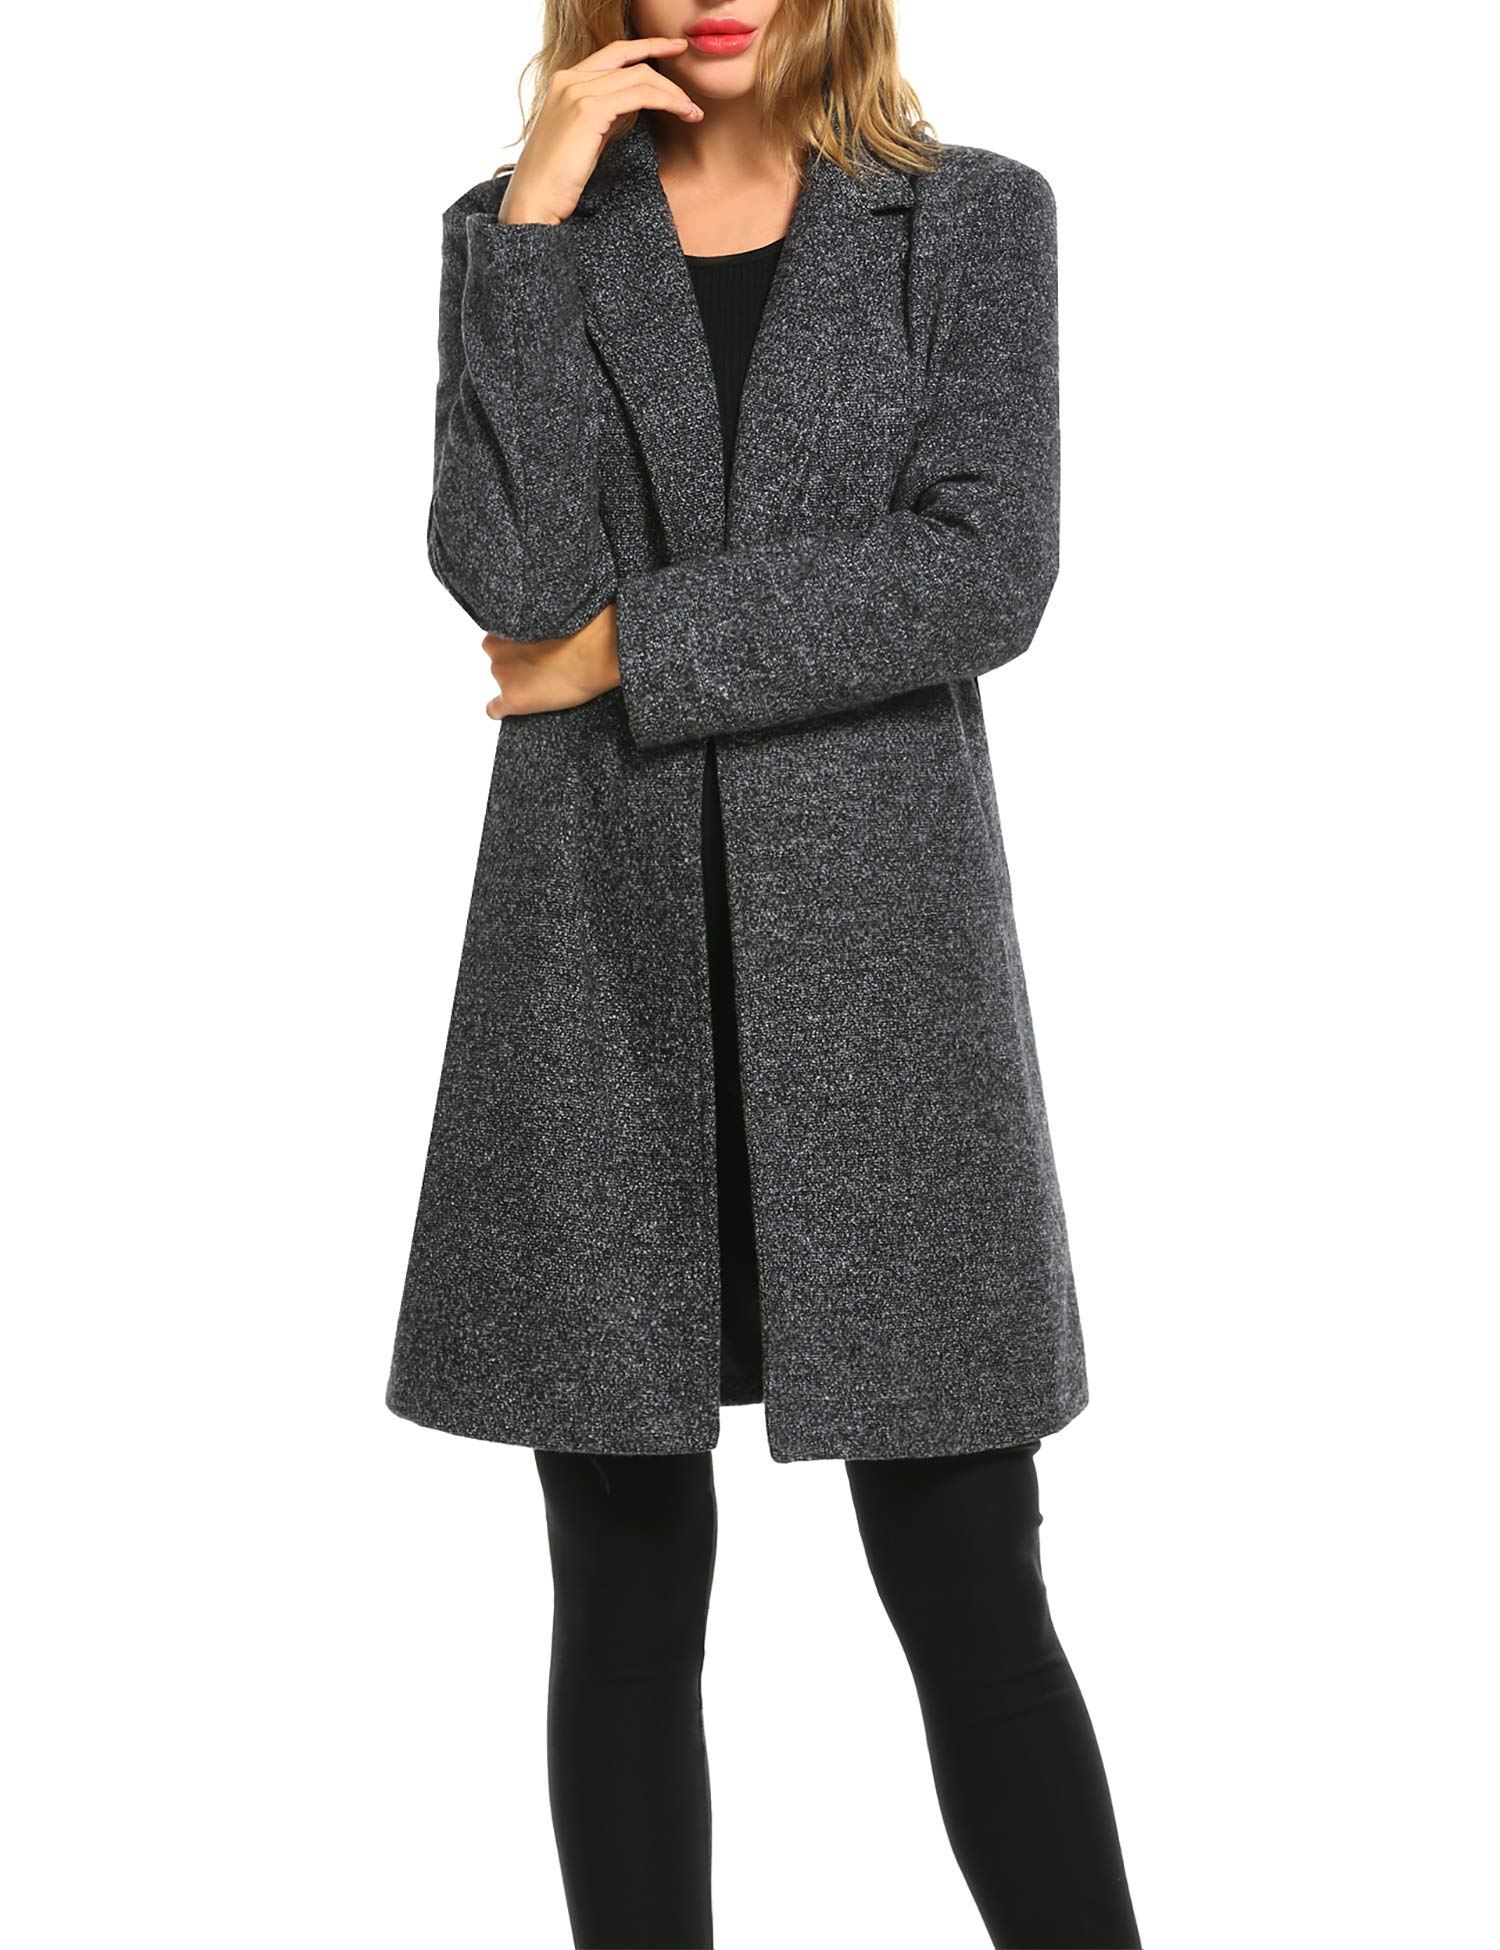 Zeagoo Women Long Trench Coat Single Breasted Wool Jacket Cardigan,Large,Black